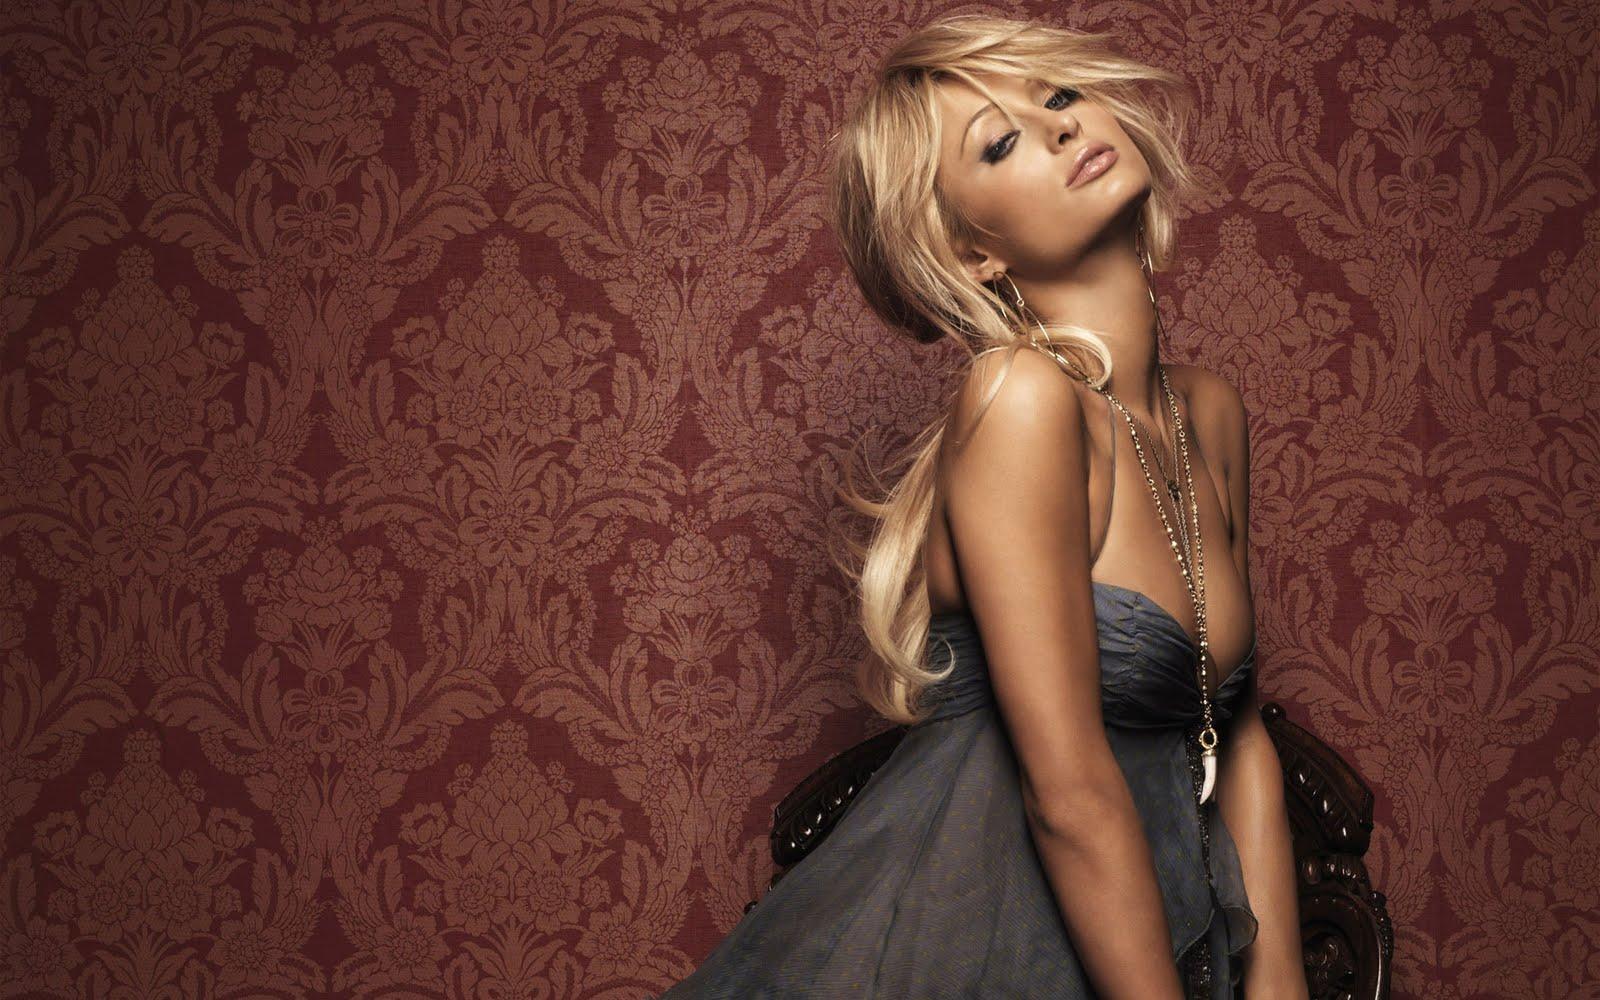 http://3.bp.blogspot.com/--nNix6Ajul8/TjhLUg_2DWI/AAAAAAAAFQc/Xef-NQOq09s/s1600/celebrities%2Bparis%2Bhilton-3.jpg